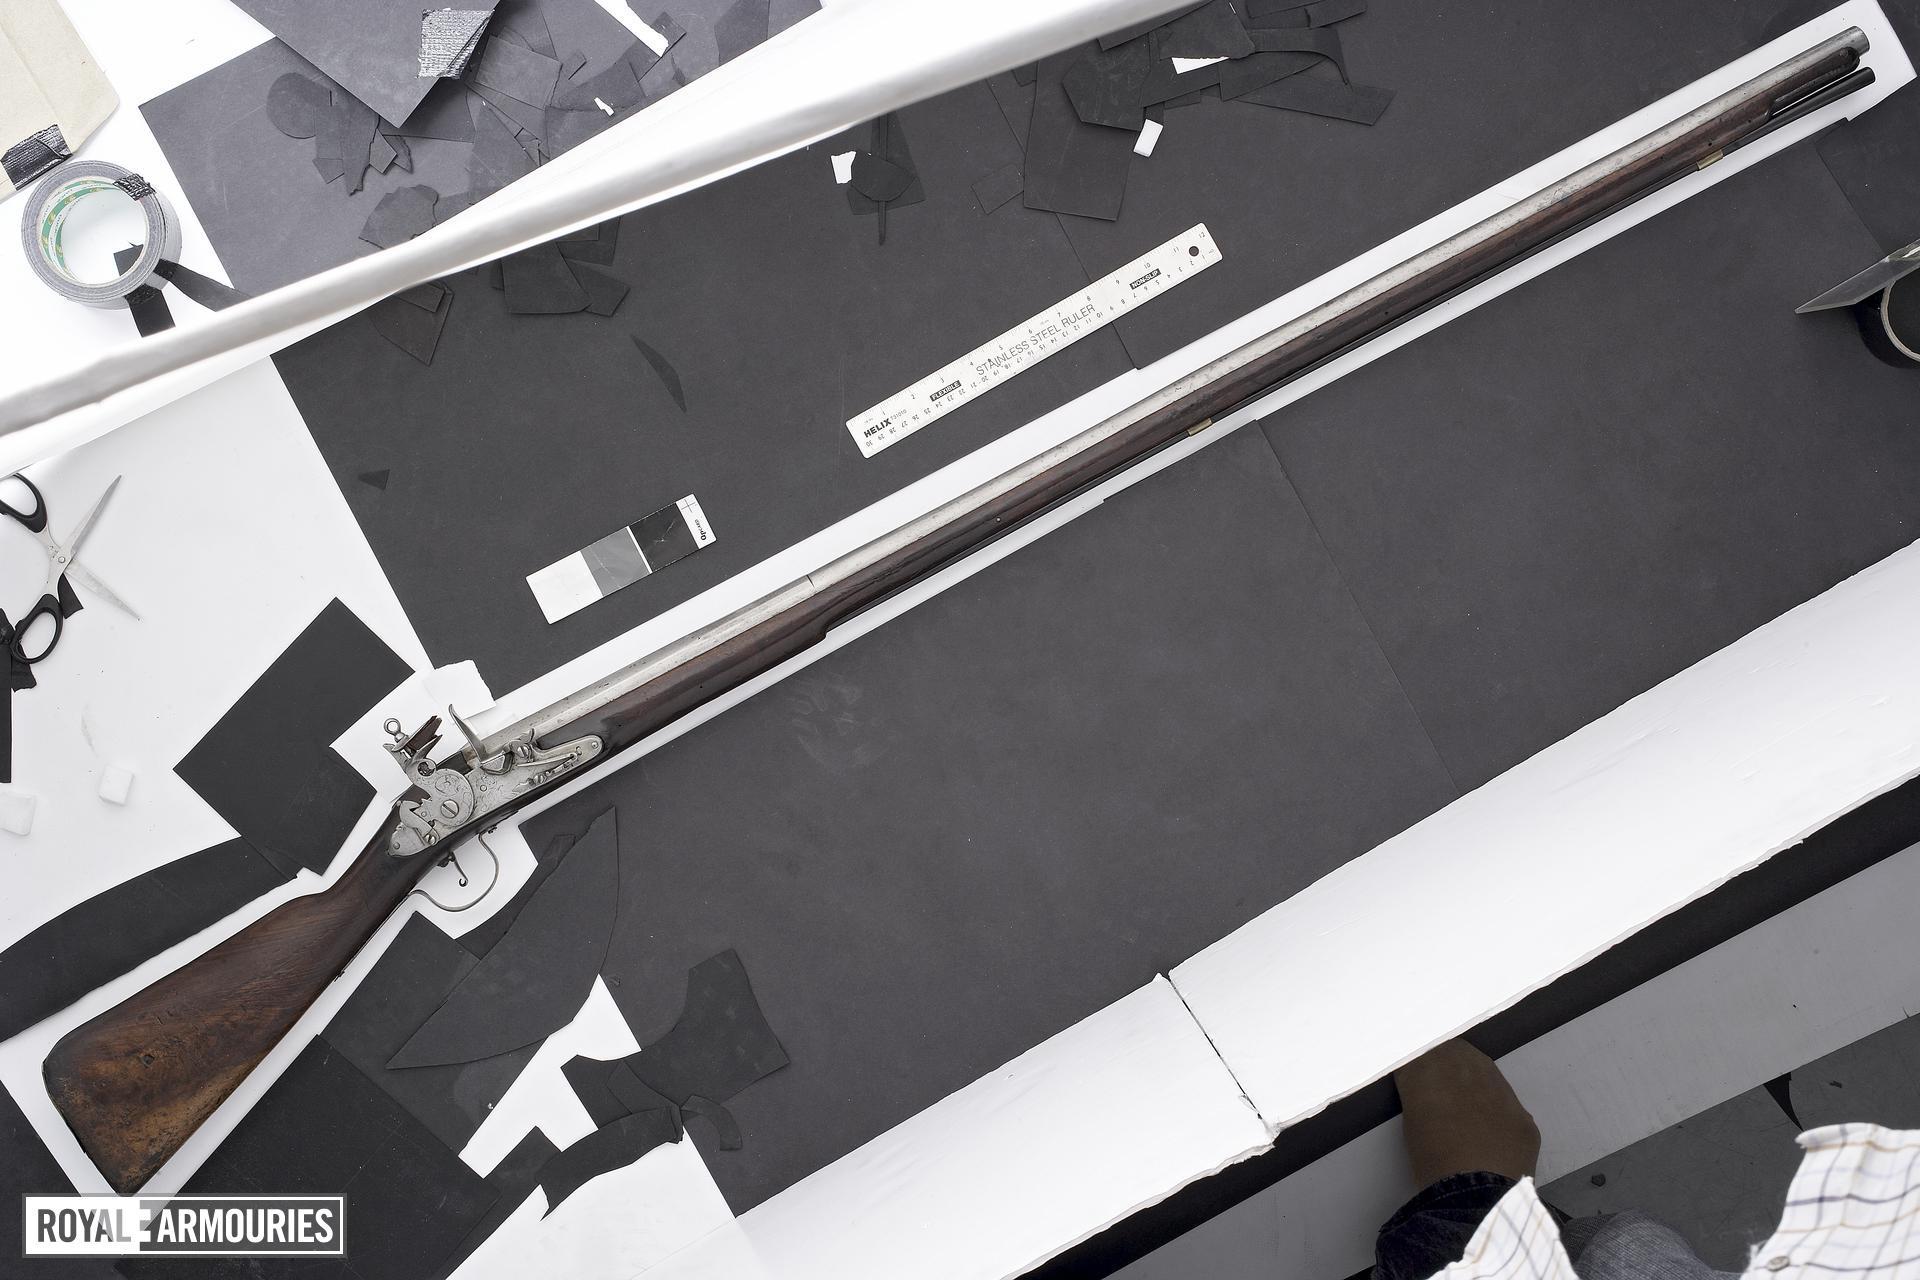 Flintlock muzzle-loading military musket - James II type